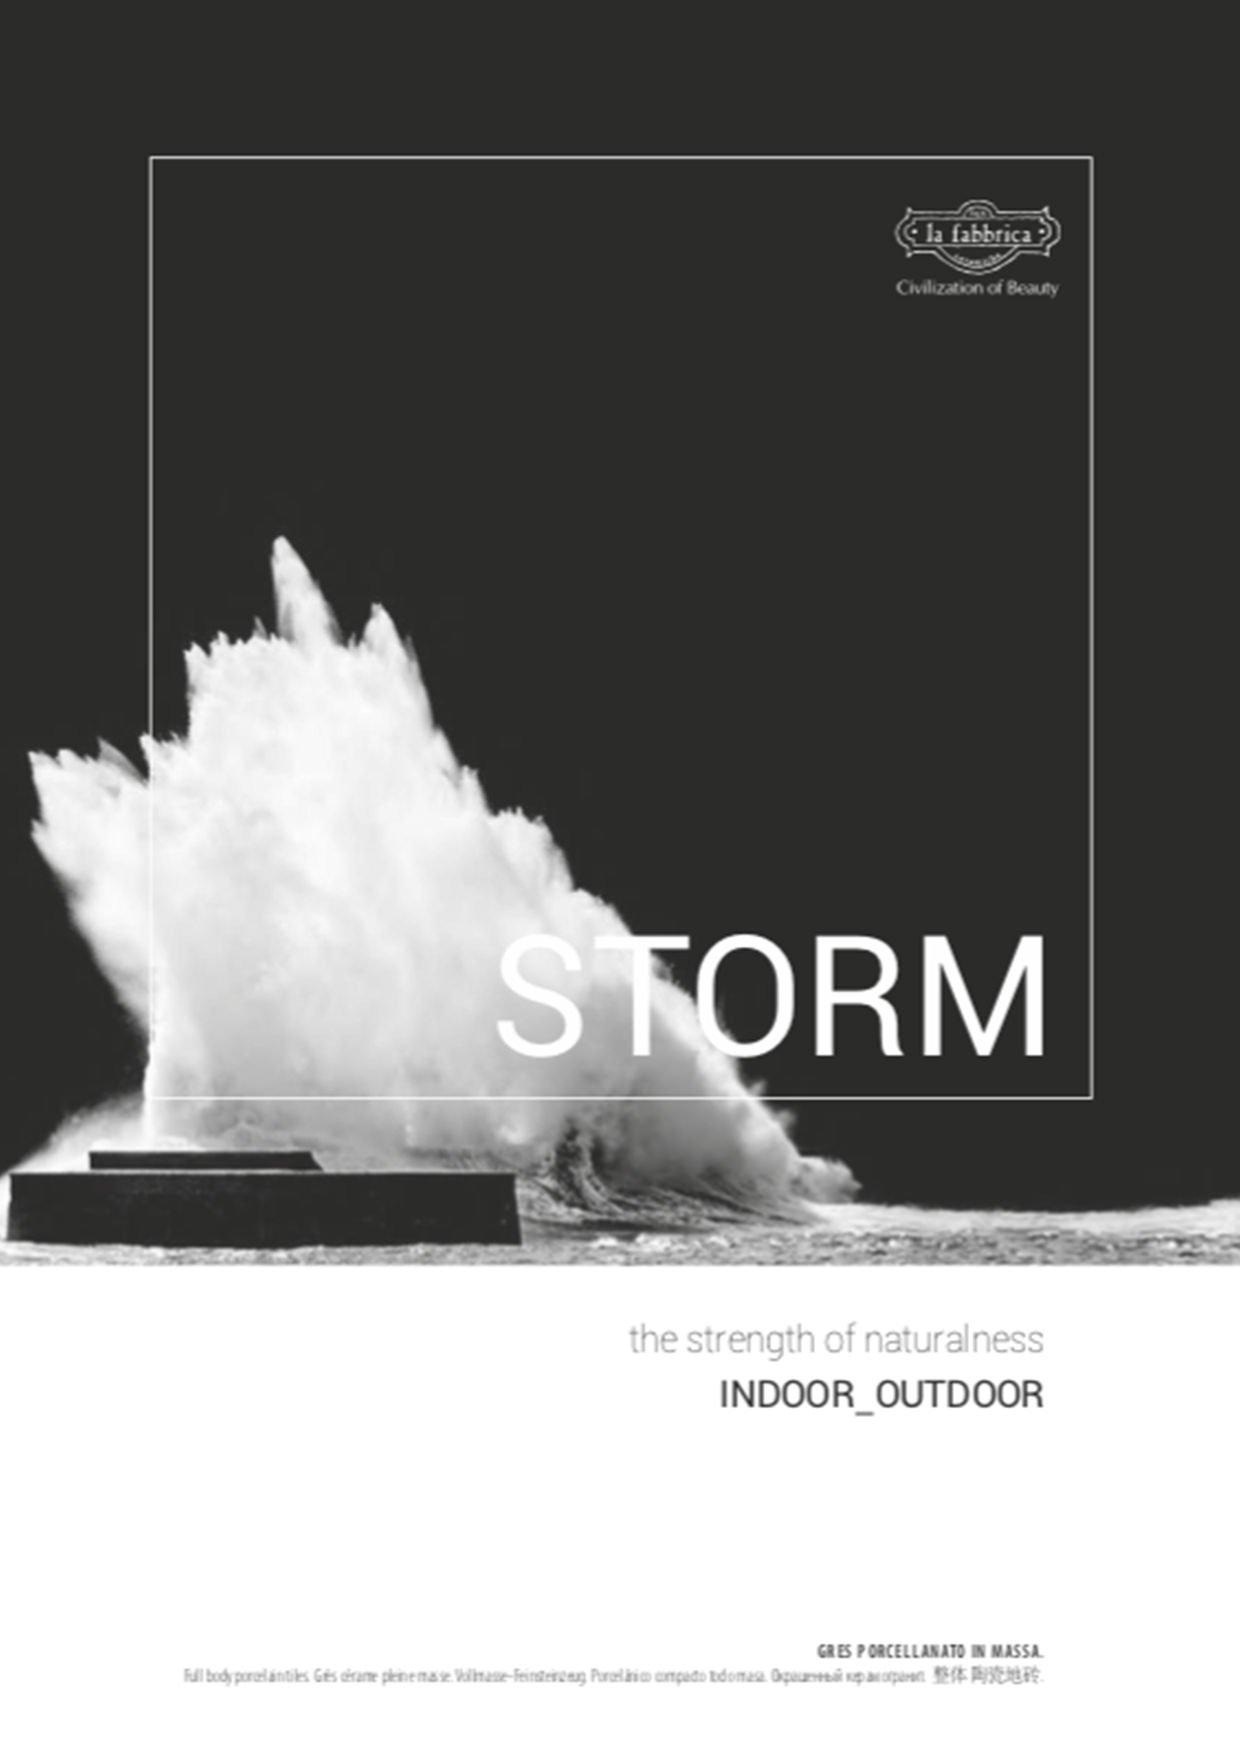 La Fabbrica Catalogo Storm